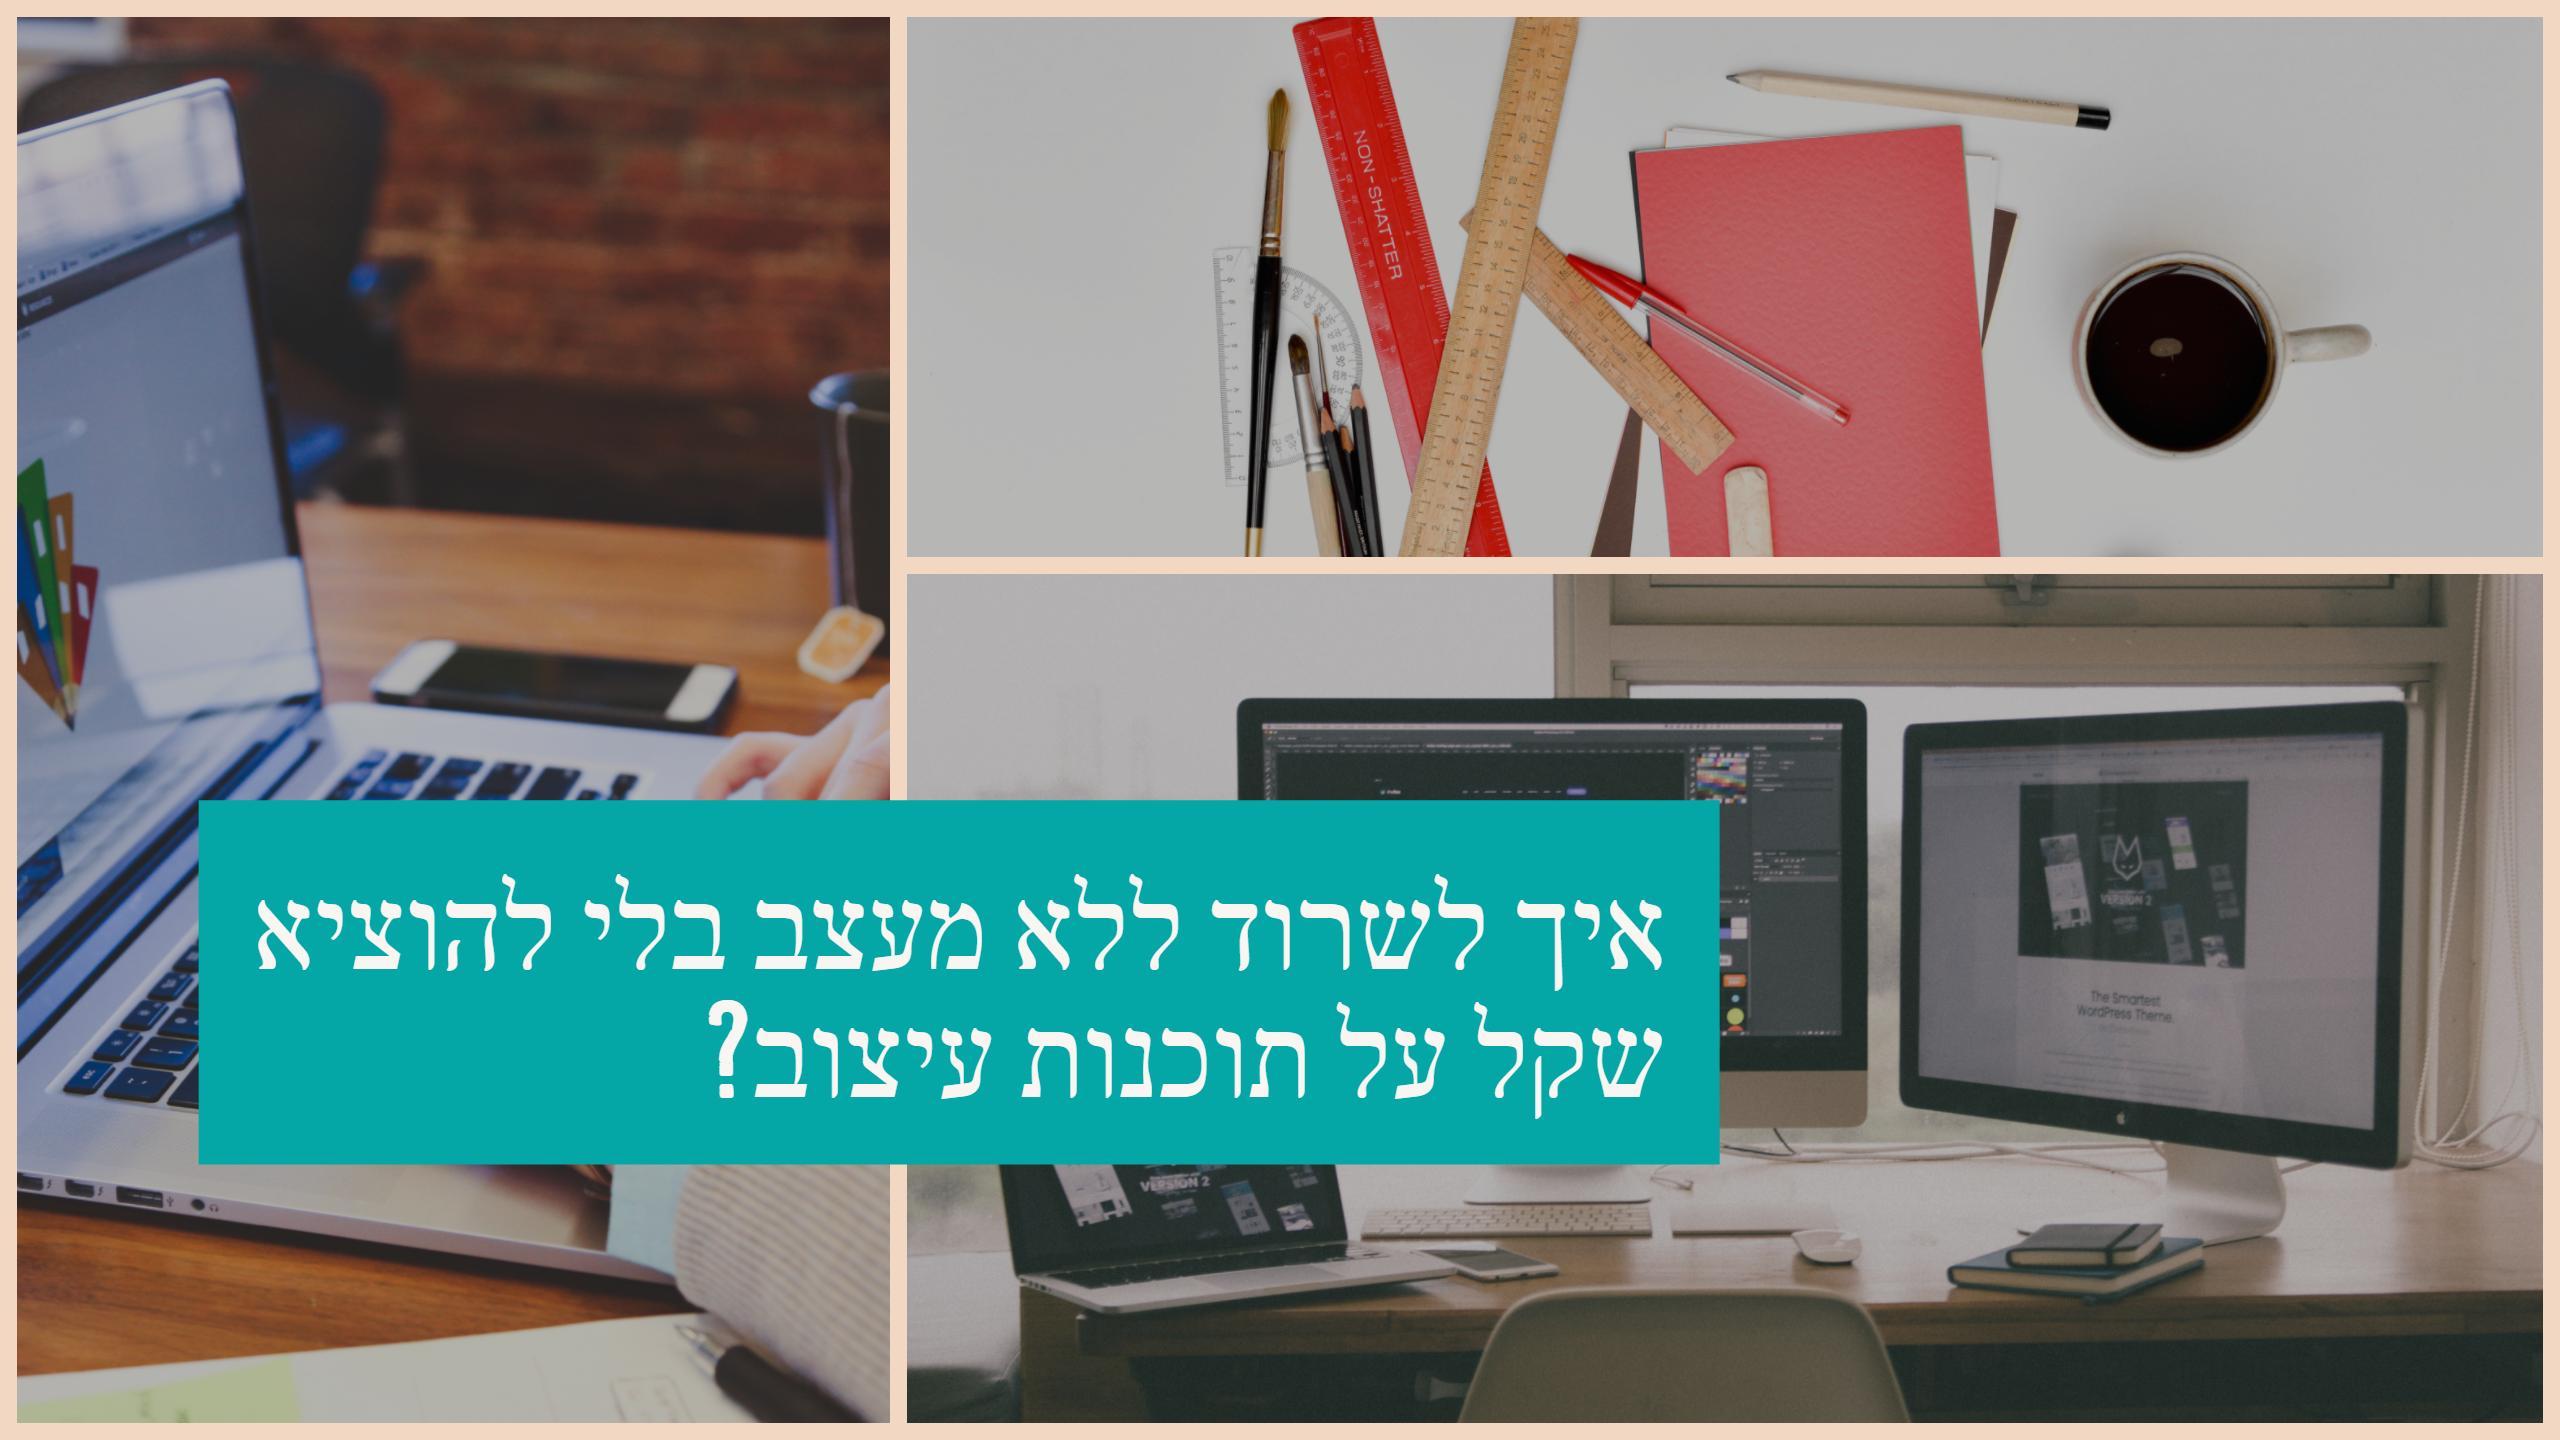 Yuris Digital יוריס דיגיטל - דוגמא לתמונת קאבר לפוסט